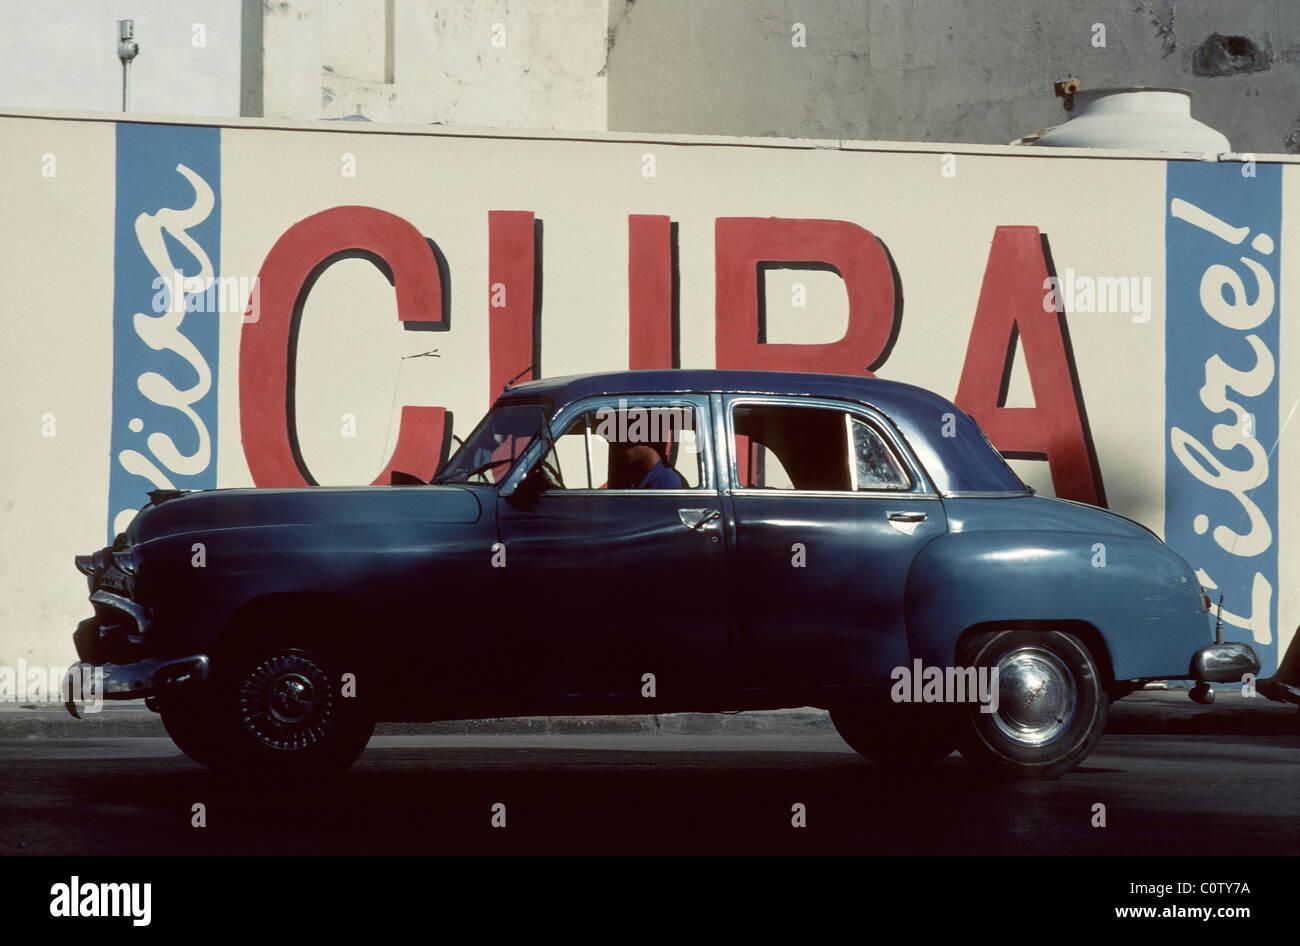 La Havane. Cuba. American Vintage voiture en face de slogan patriotique 'Viva Cuba Libre' dans la vieille Photo Stock